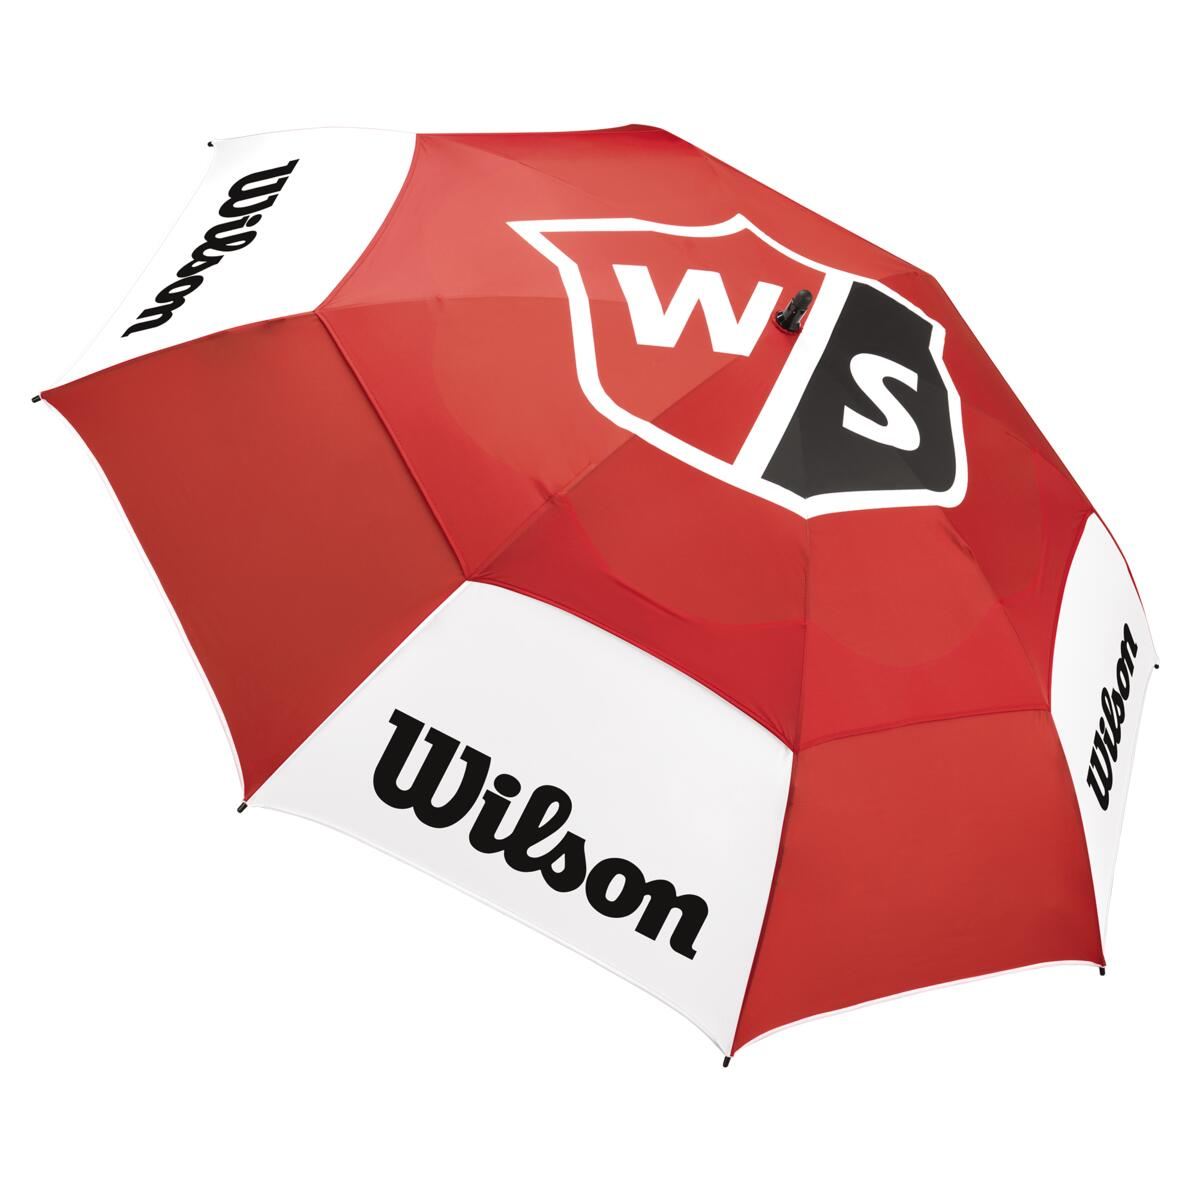 Wilson - Umbrella, Wilson Staff 2020